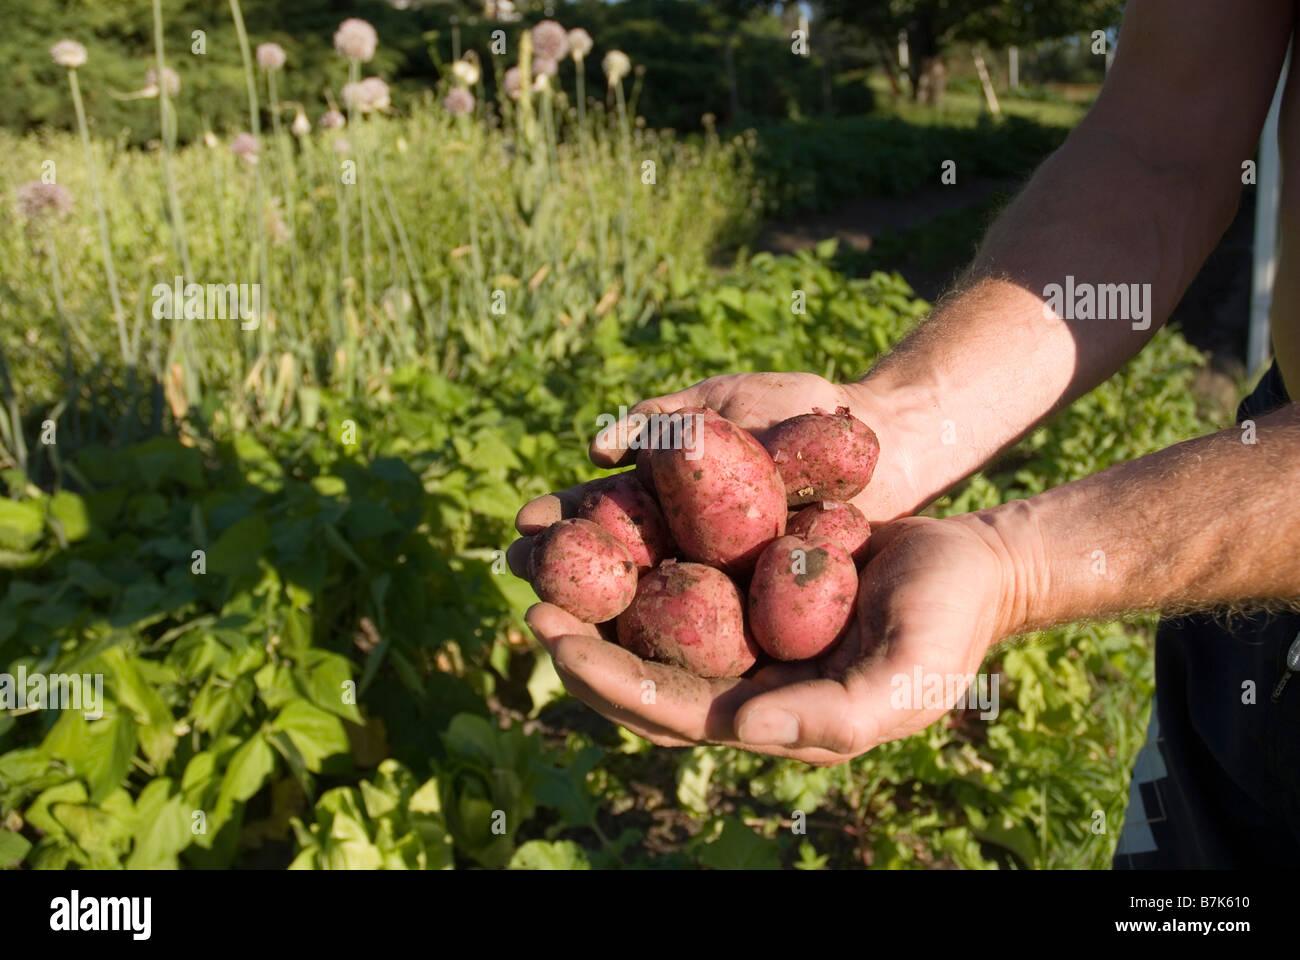 Hands holding fresh locally grown potatoes, Okanagan Centre, BC Canada - Stock Image